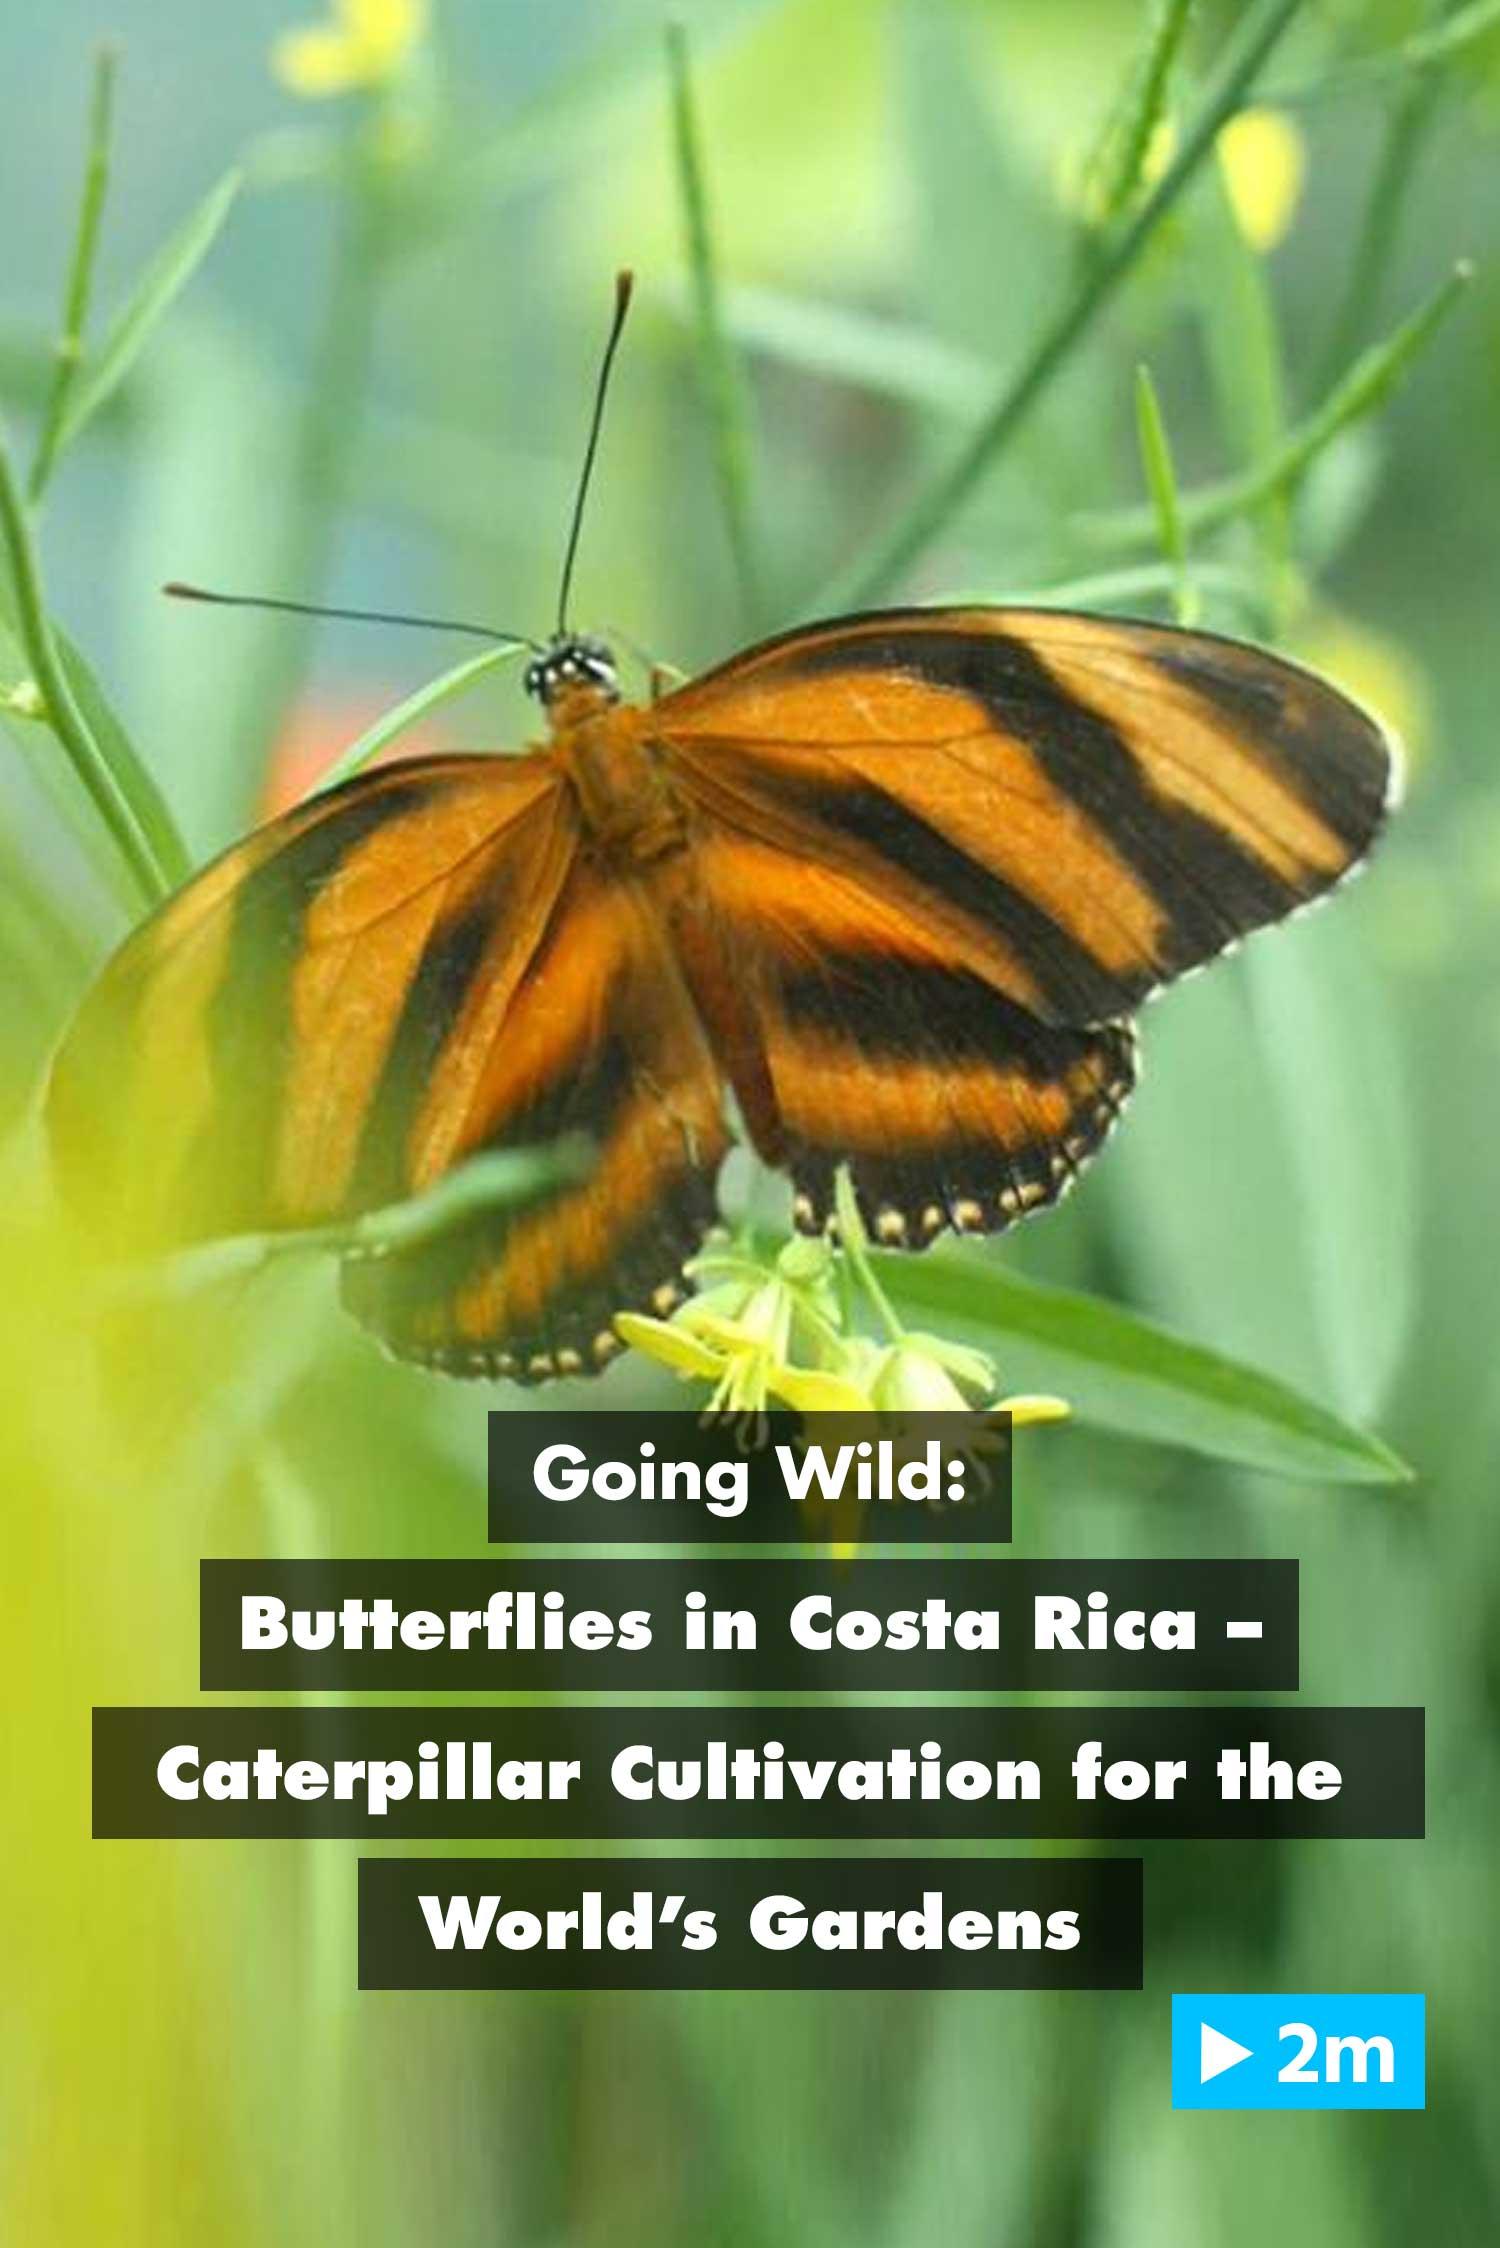 Going Wild: Butterflies in Costa Rica – Caterpillar Cultivation for the World's Gardens